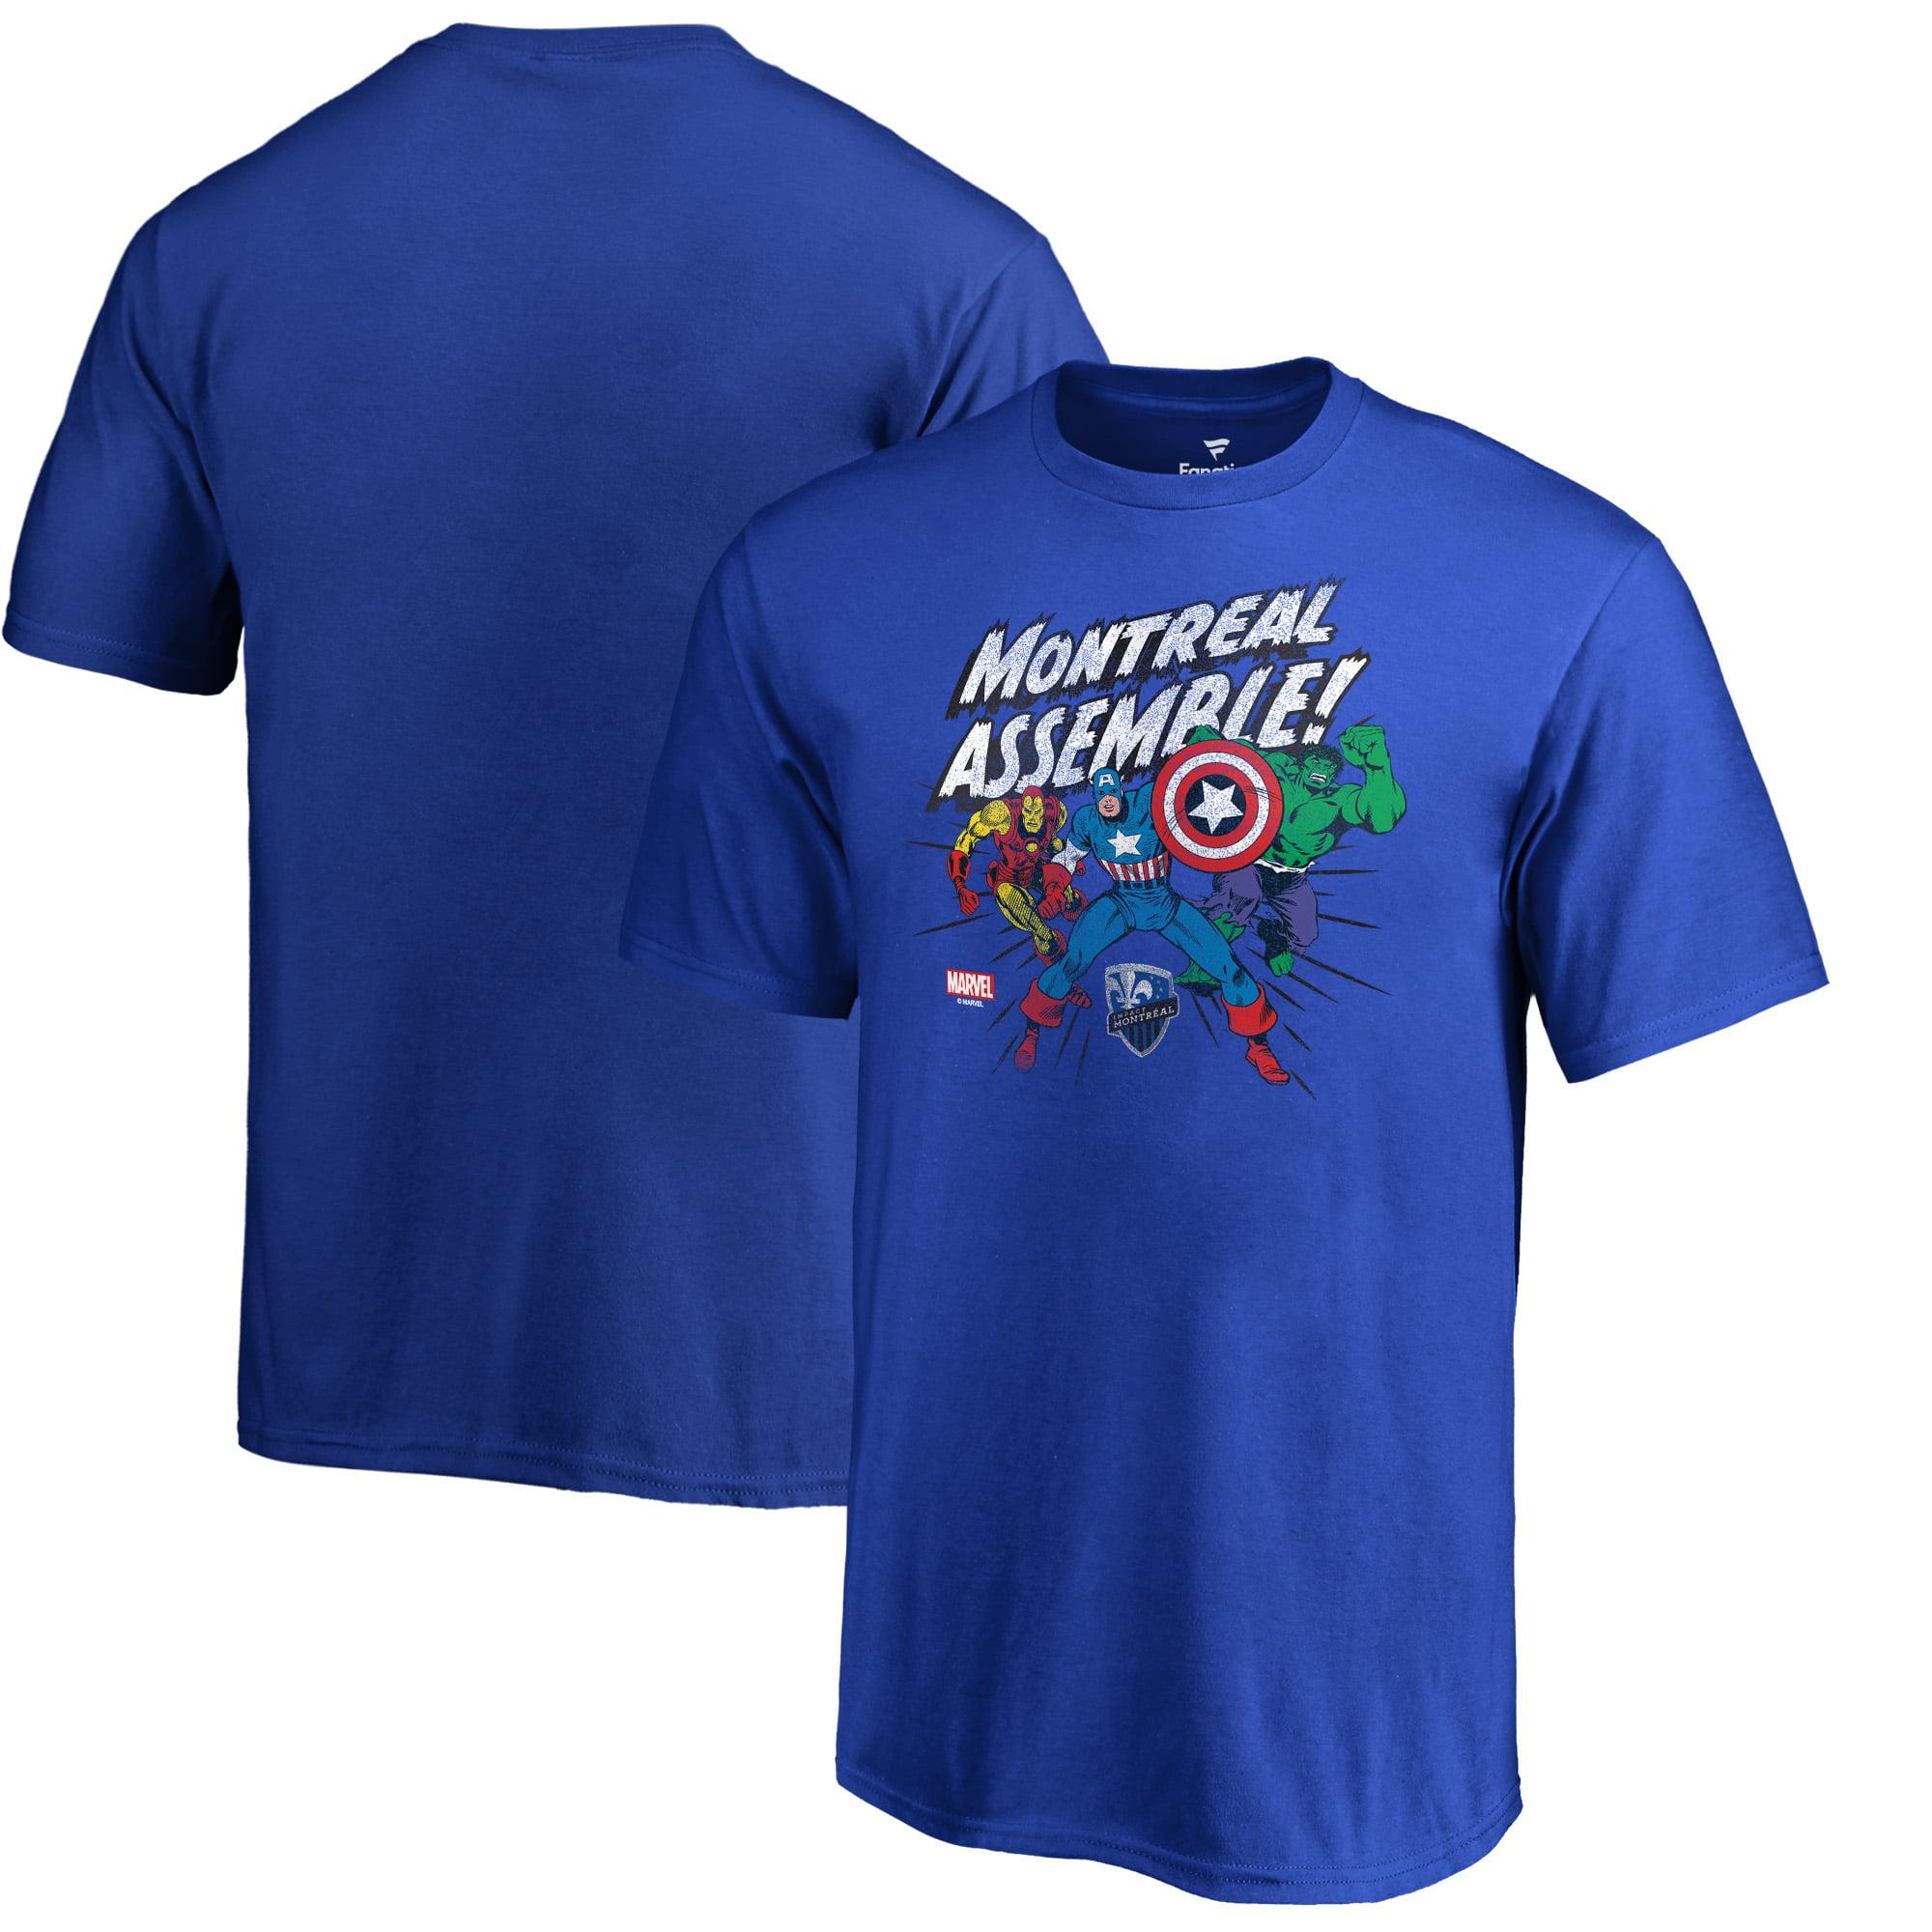 Montreal Impact Fanatics Branded Youth Marvel Avengers Assemble T-Shirt - Royal